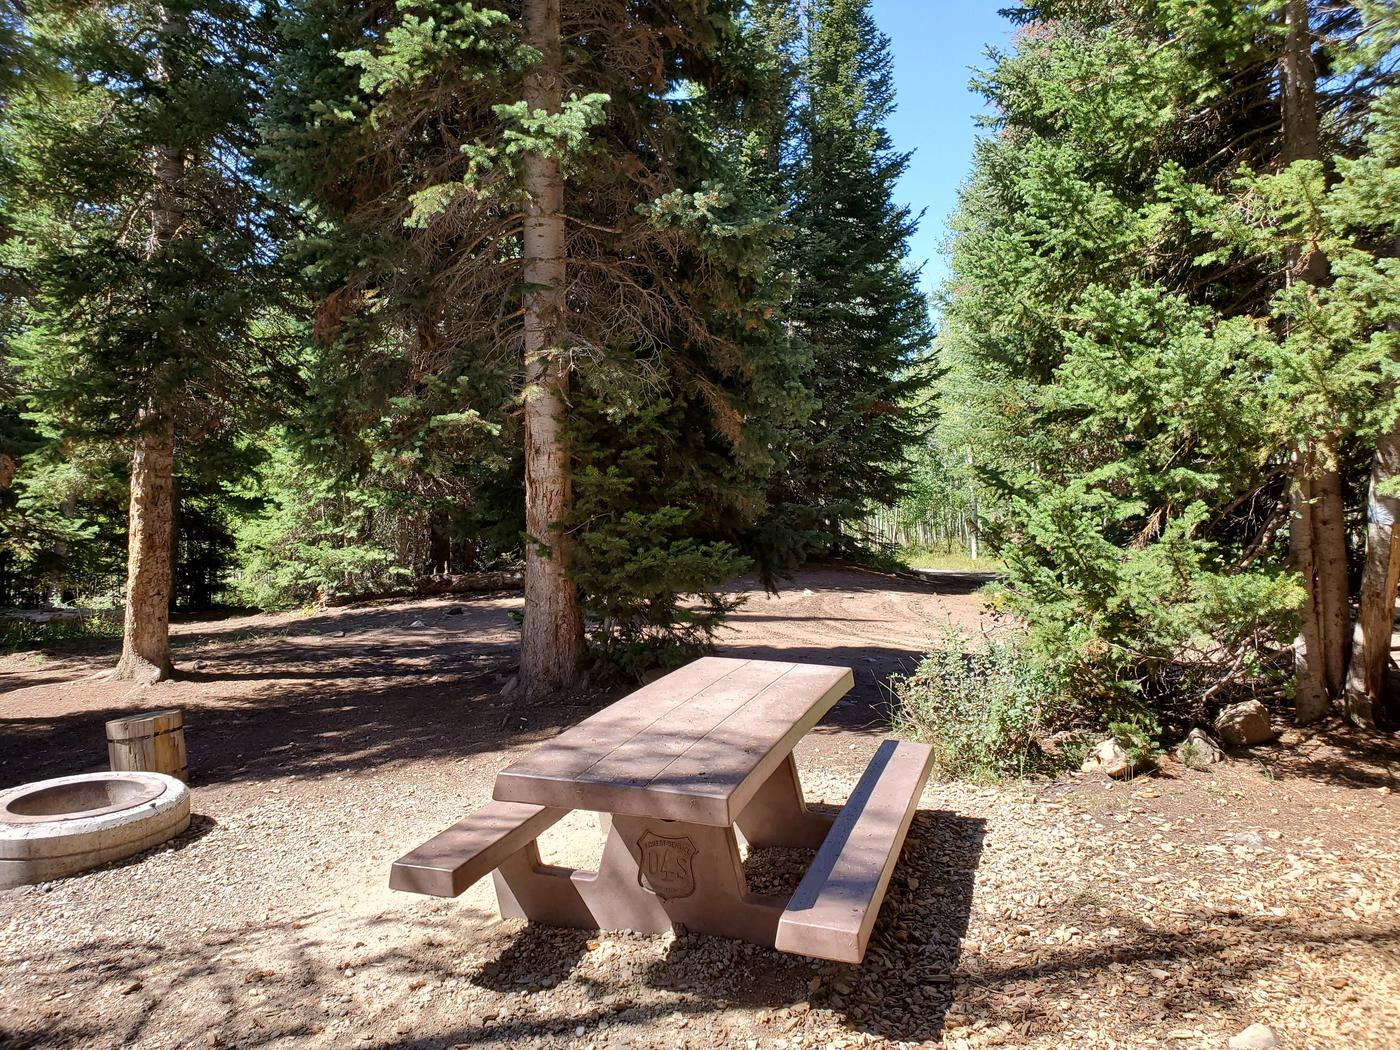 Lake Canyon Campground - Site 13